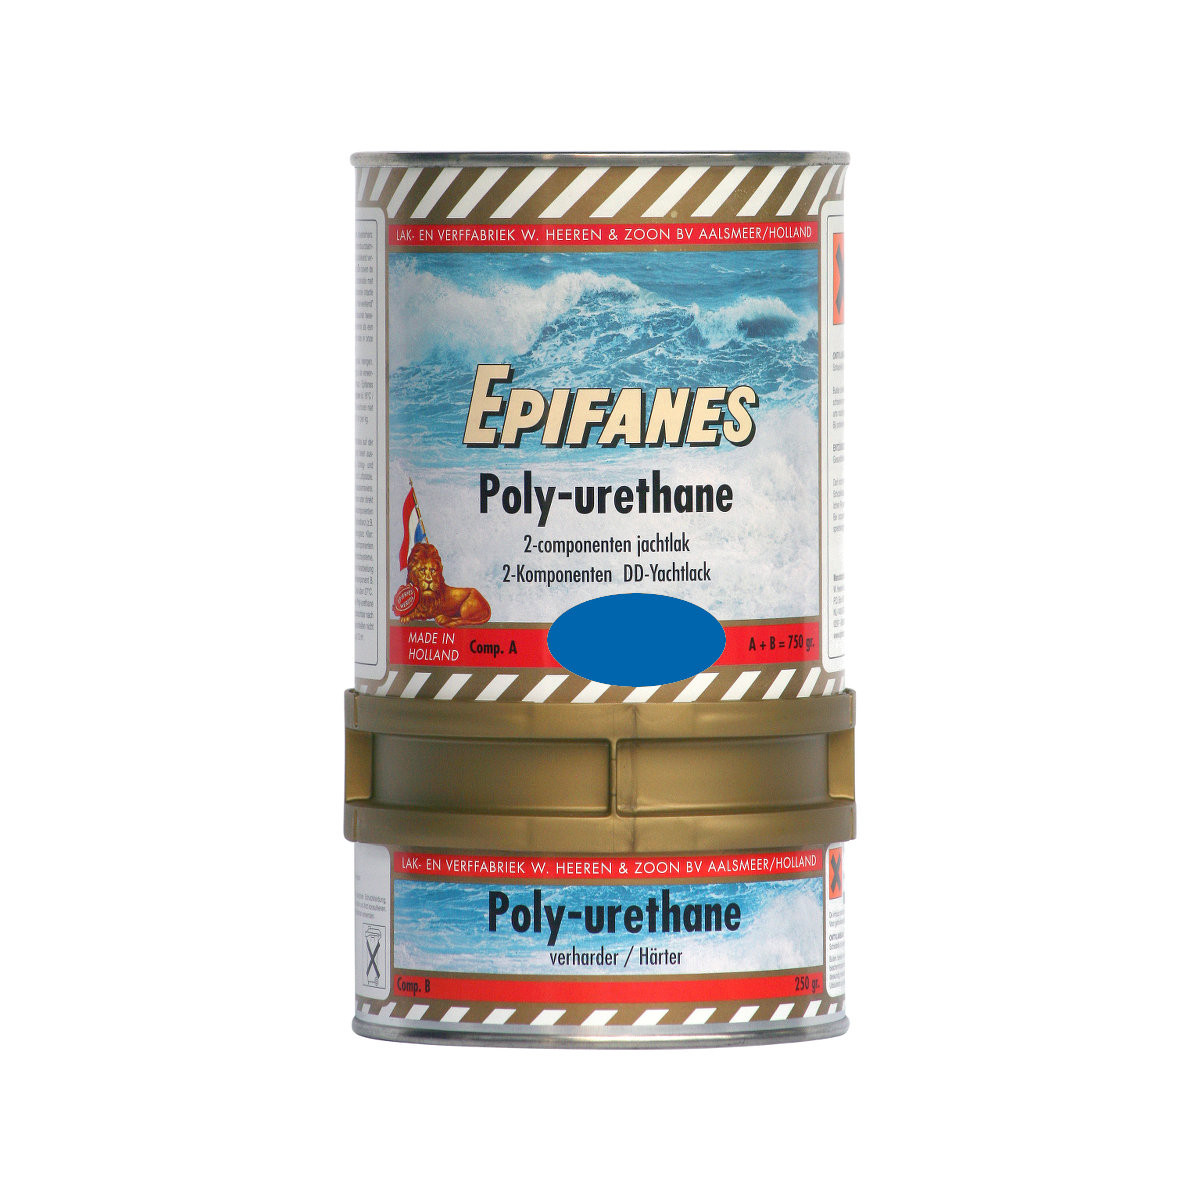 Epifanes poly-urethane DD jachtlak - middenblauw 852, 750g